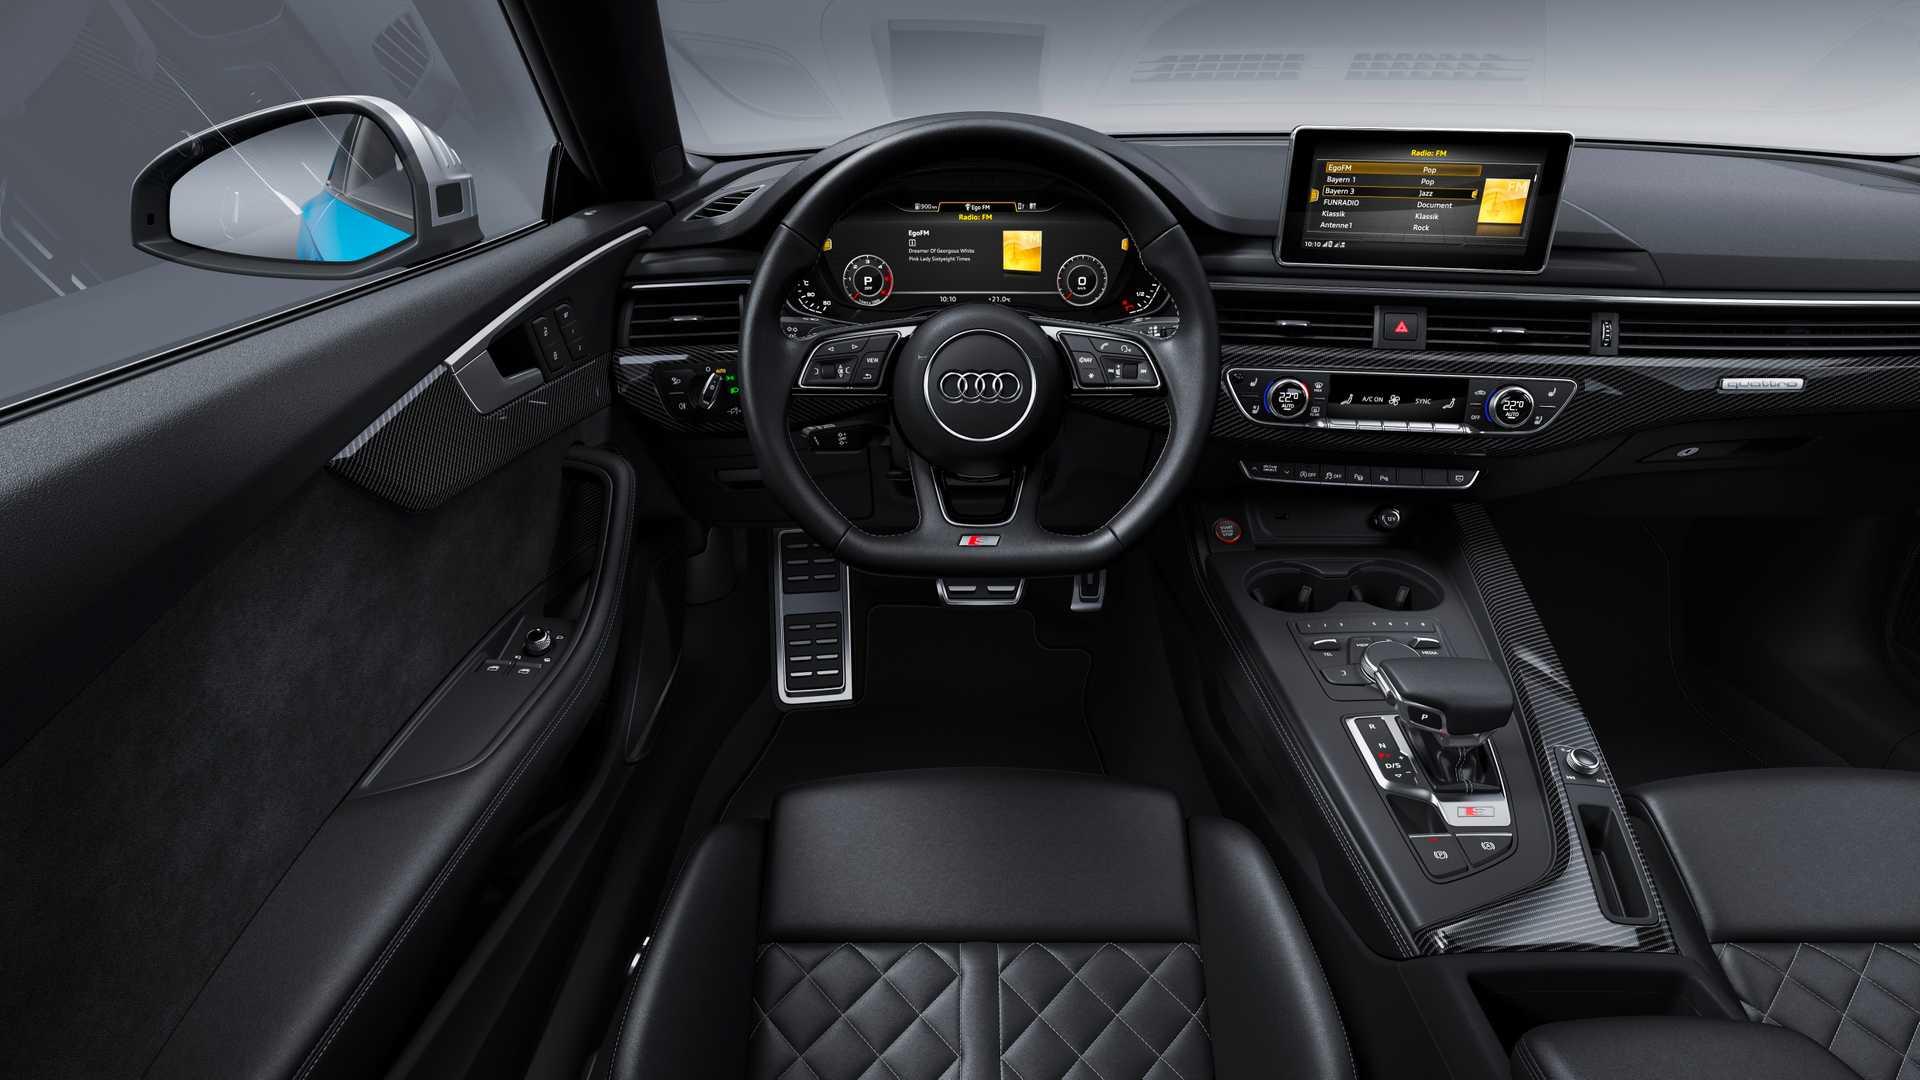 2019 Audi S5 Coupé TDI Interior Cockpit Wallpapers #16 of 17